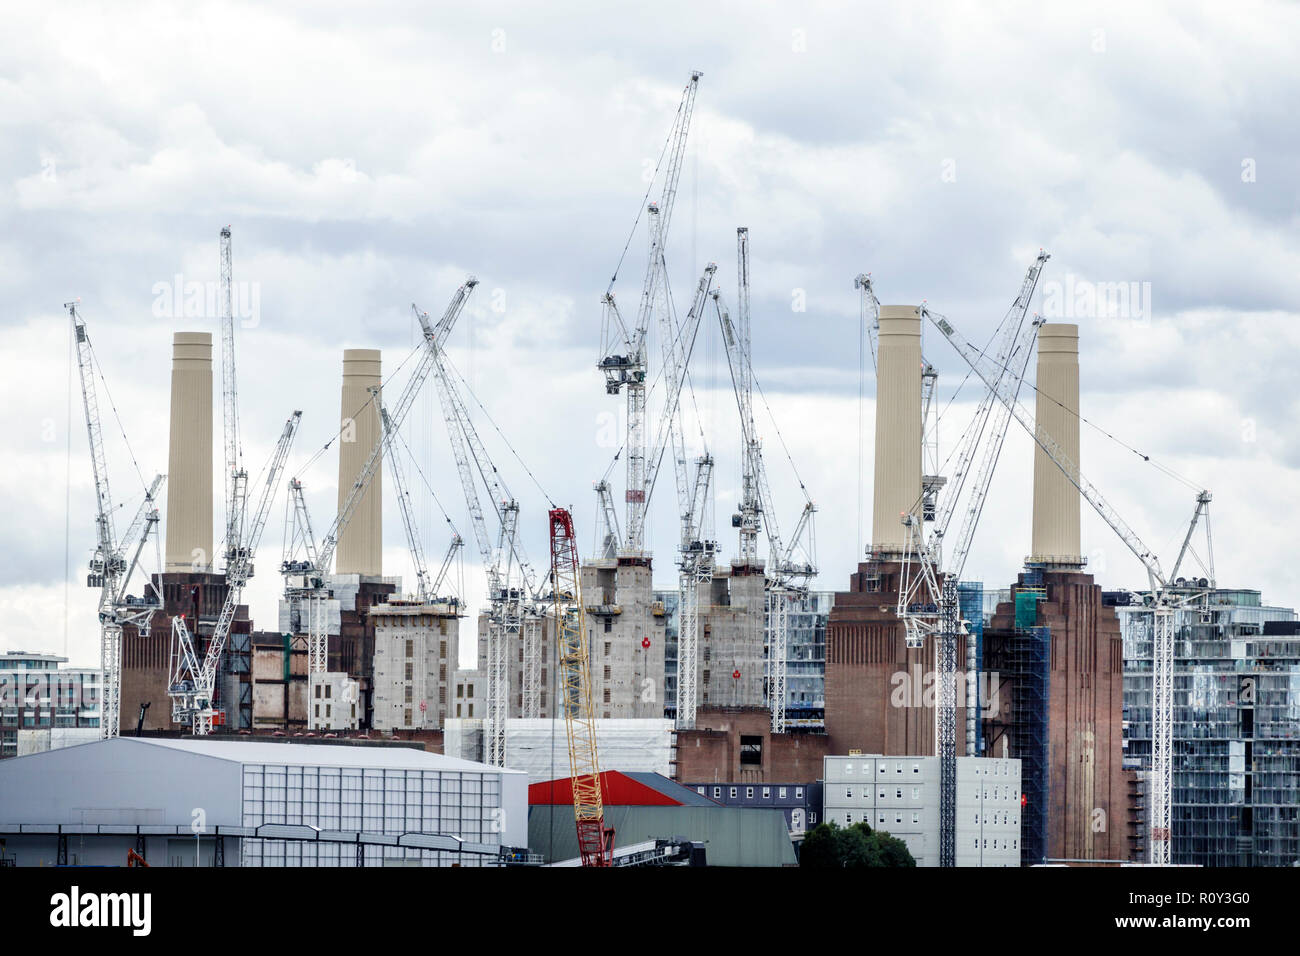 London England United Kingdom Great Britain Battersea Power Station Estates repurpose abandoned industrial site redevelopment revitalization chimneys - Stock Image